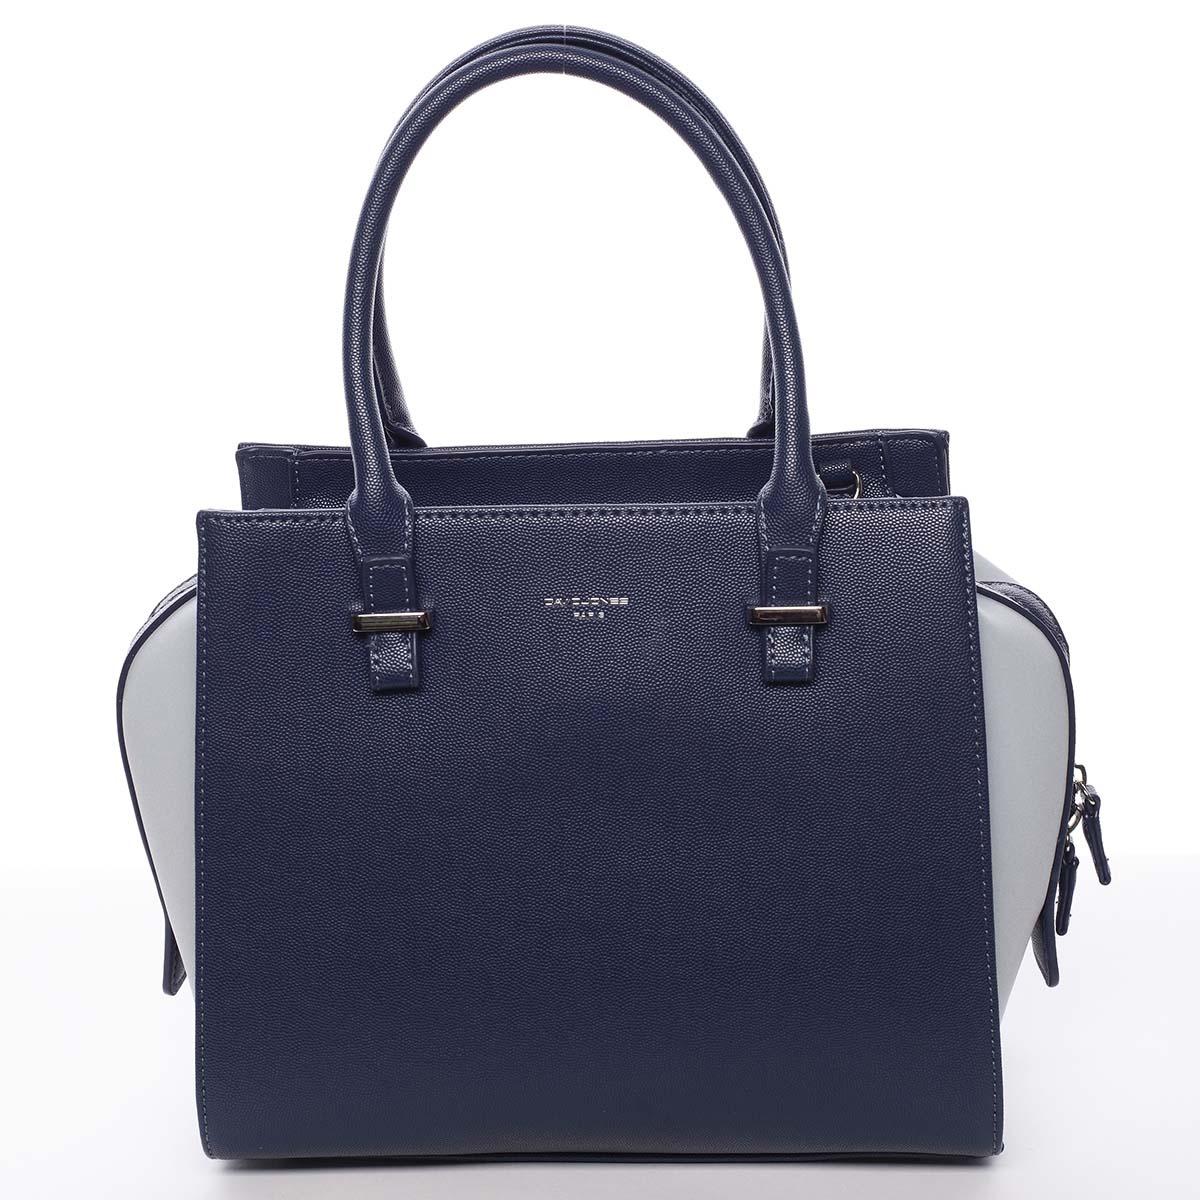 Luxusná módna modrá kabelka cez rameno - David Jones Ariana modrá